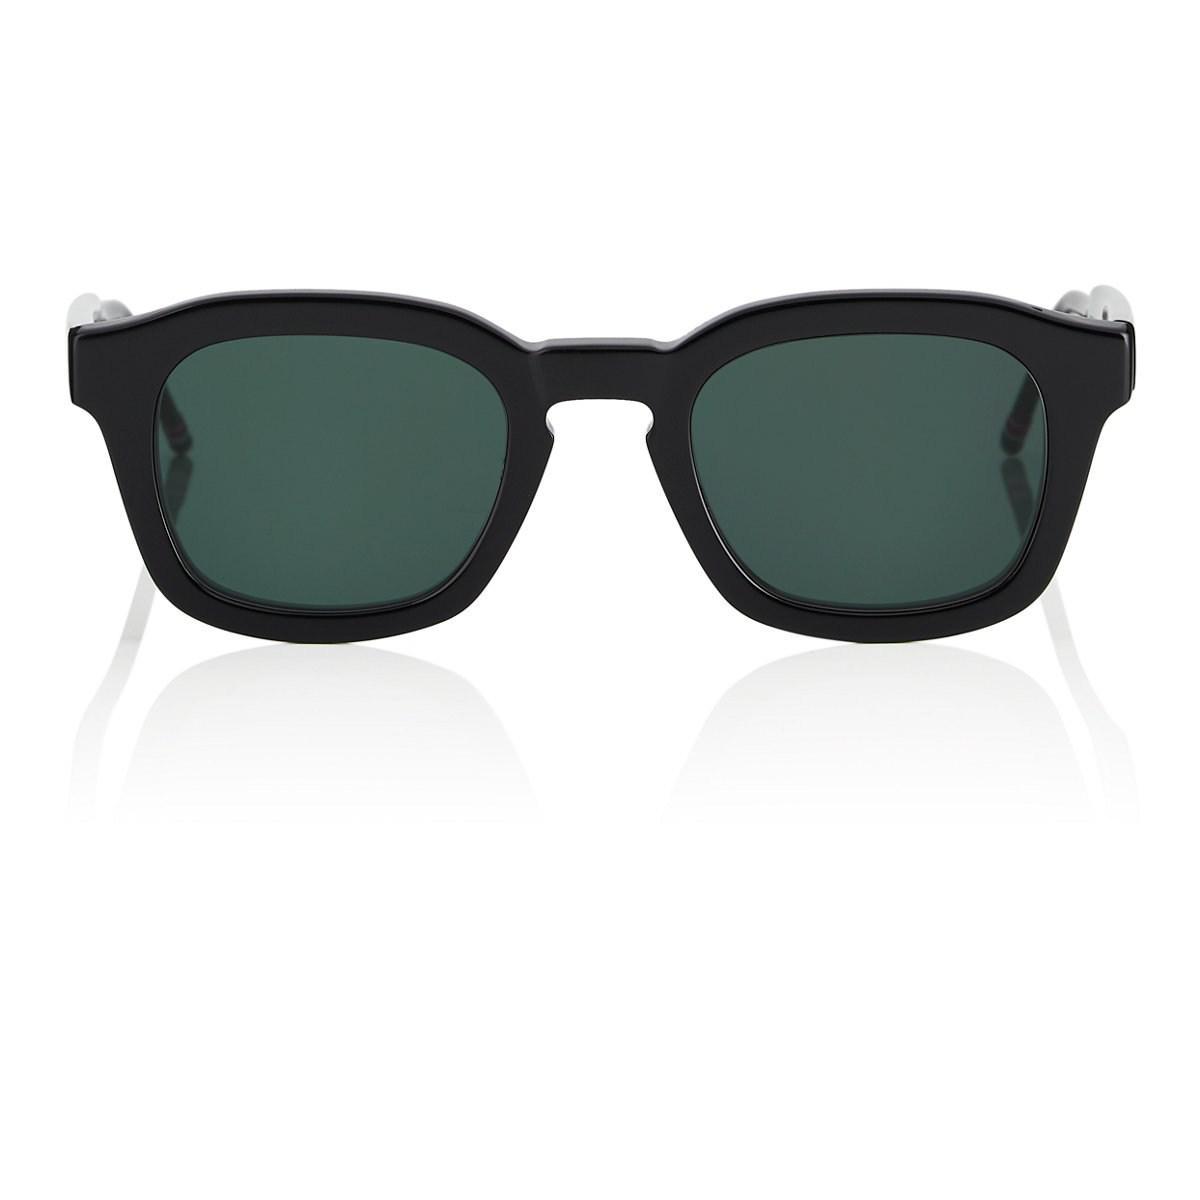 9714c8fde971 Thom Browne Tb-412 Sunglasses in Black for Men - Lyst